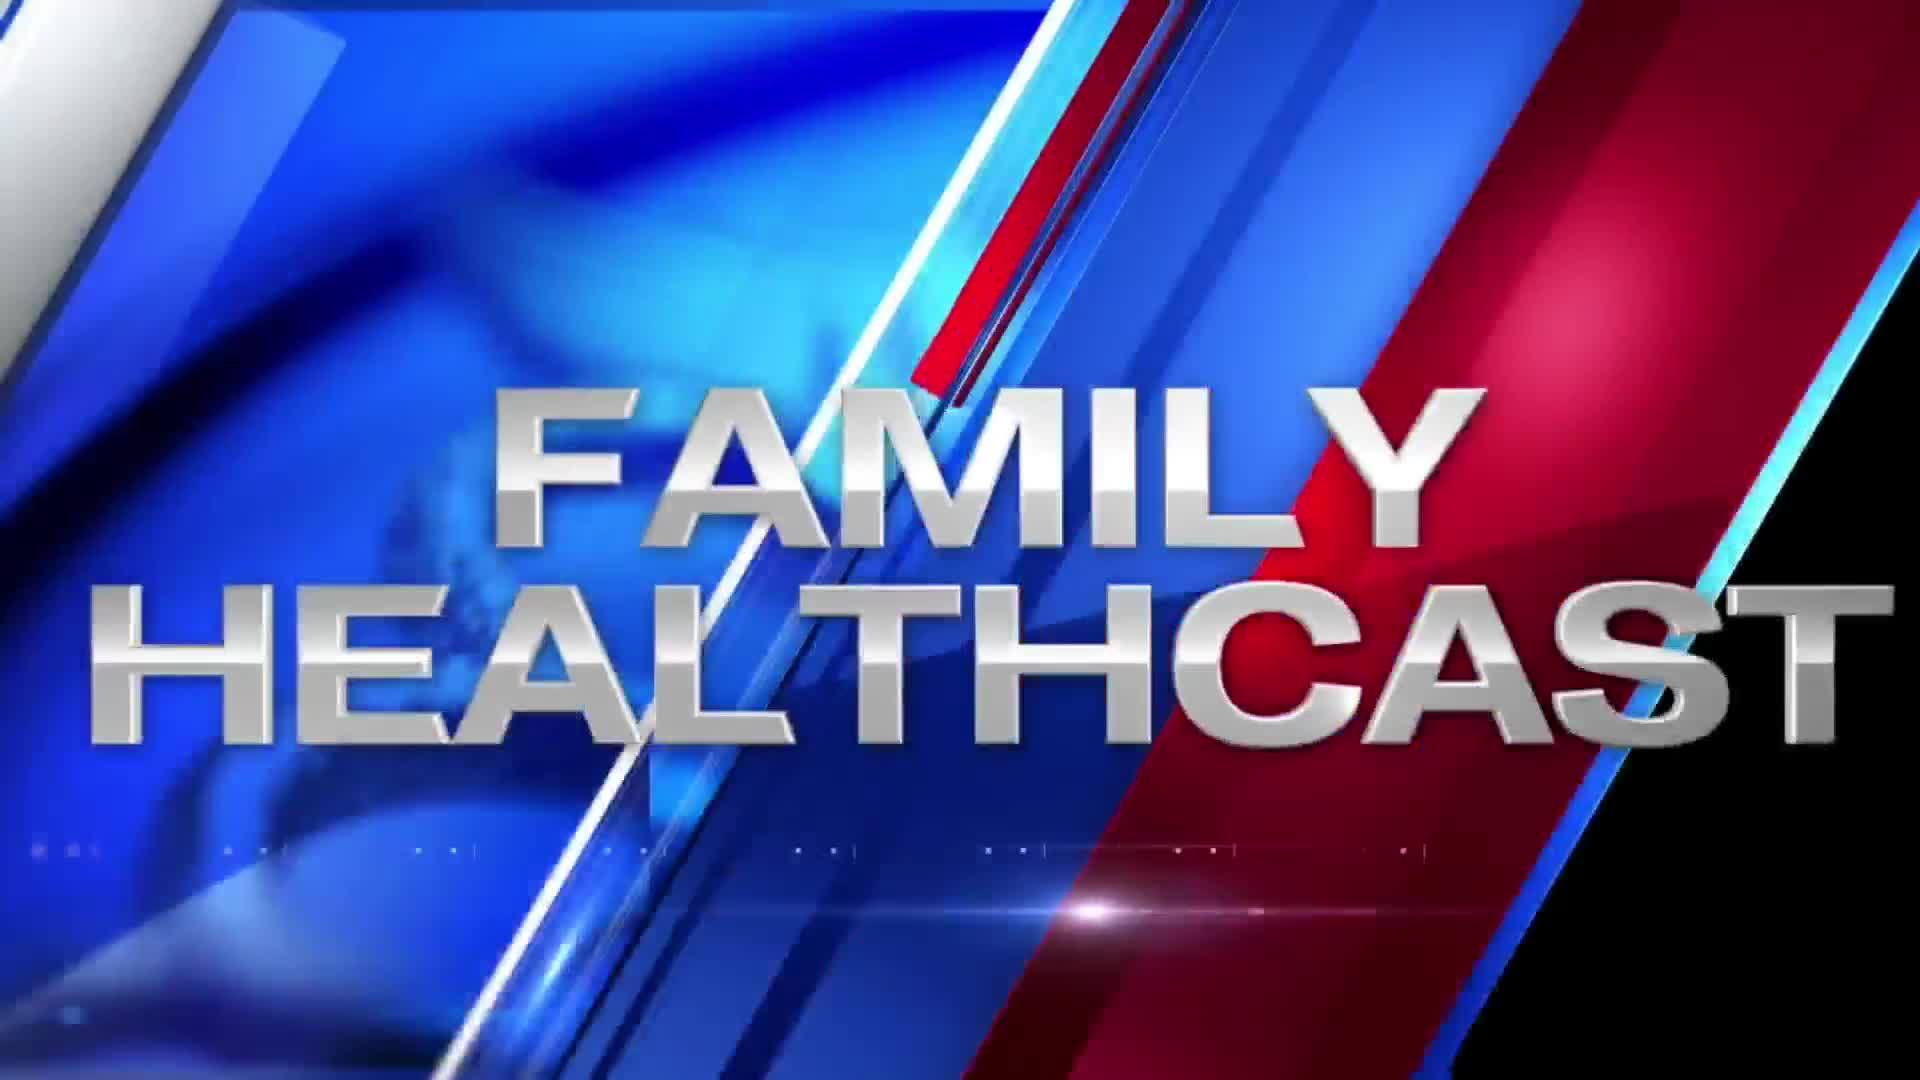 Family_Healthcast__6_4_19_1_20190604220452